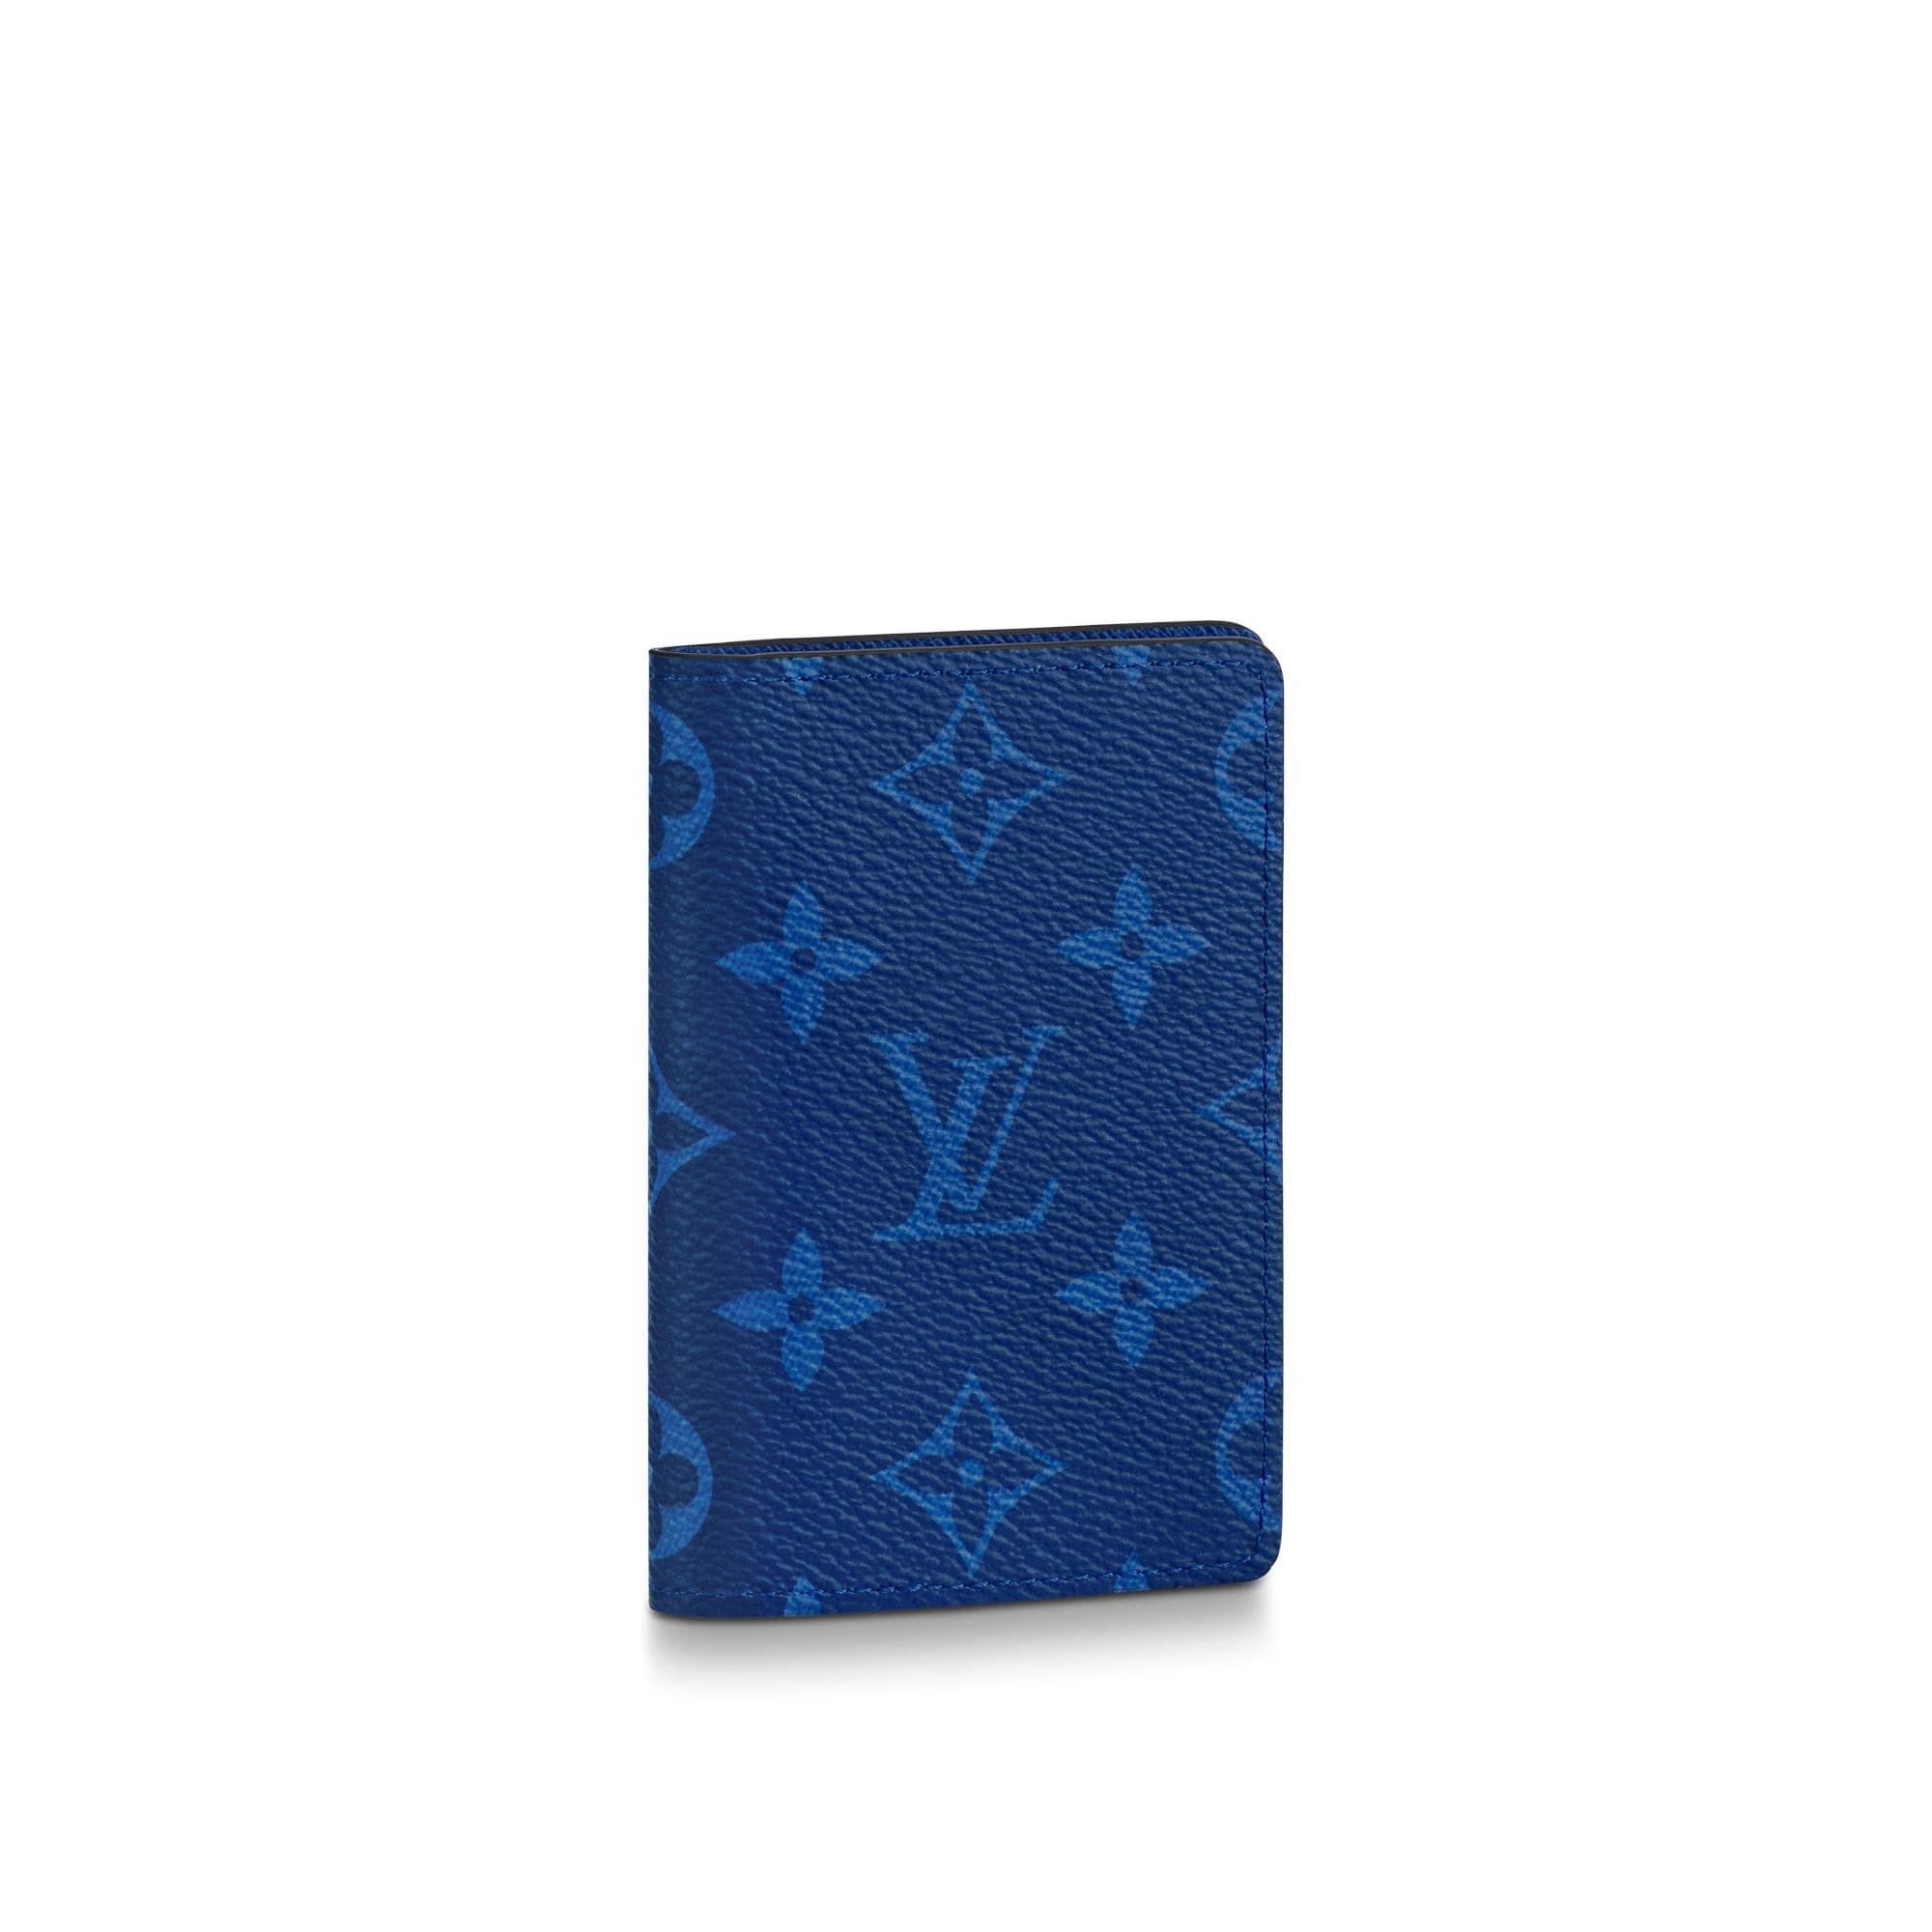 Louis Vuitton Pocket Organizer Monogram Pacific Taiga Blue